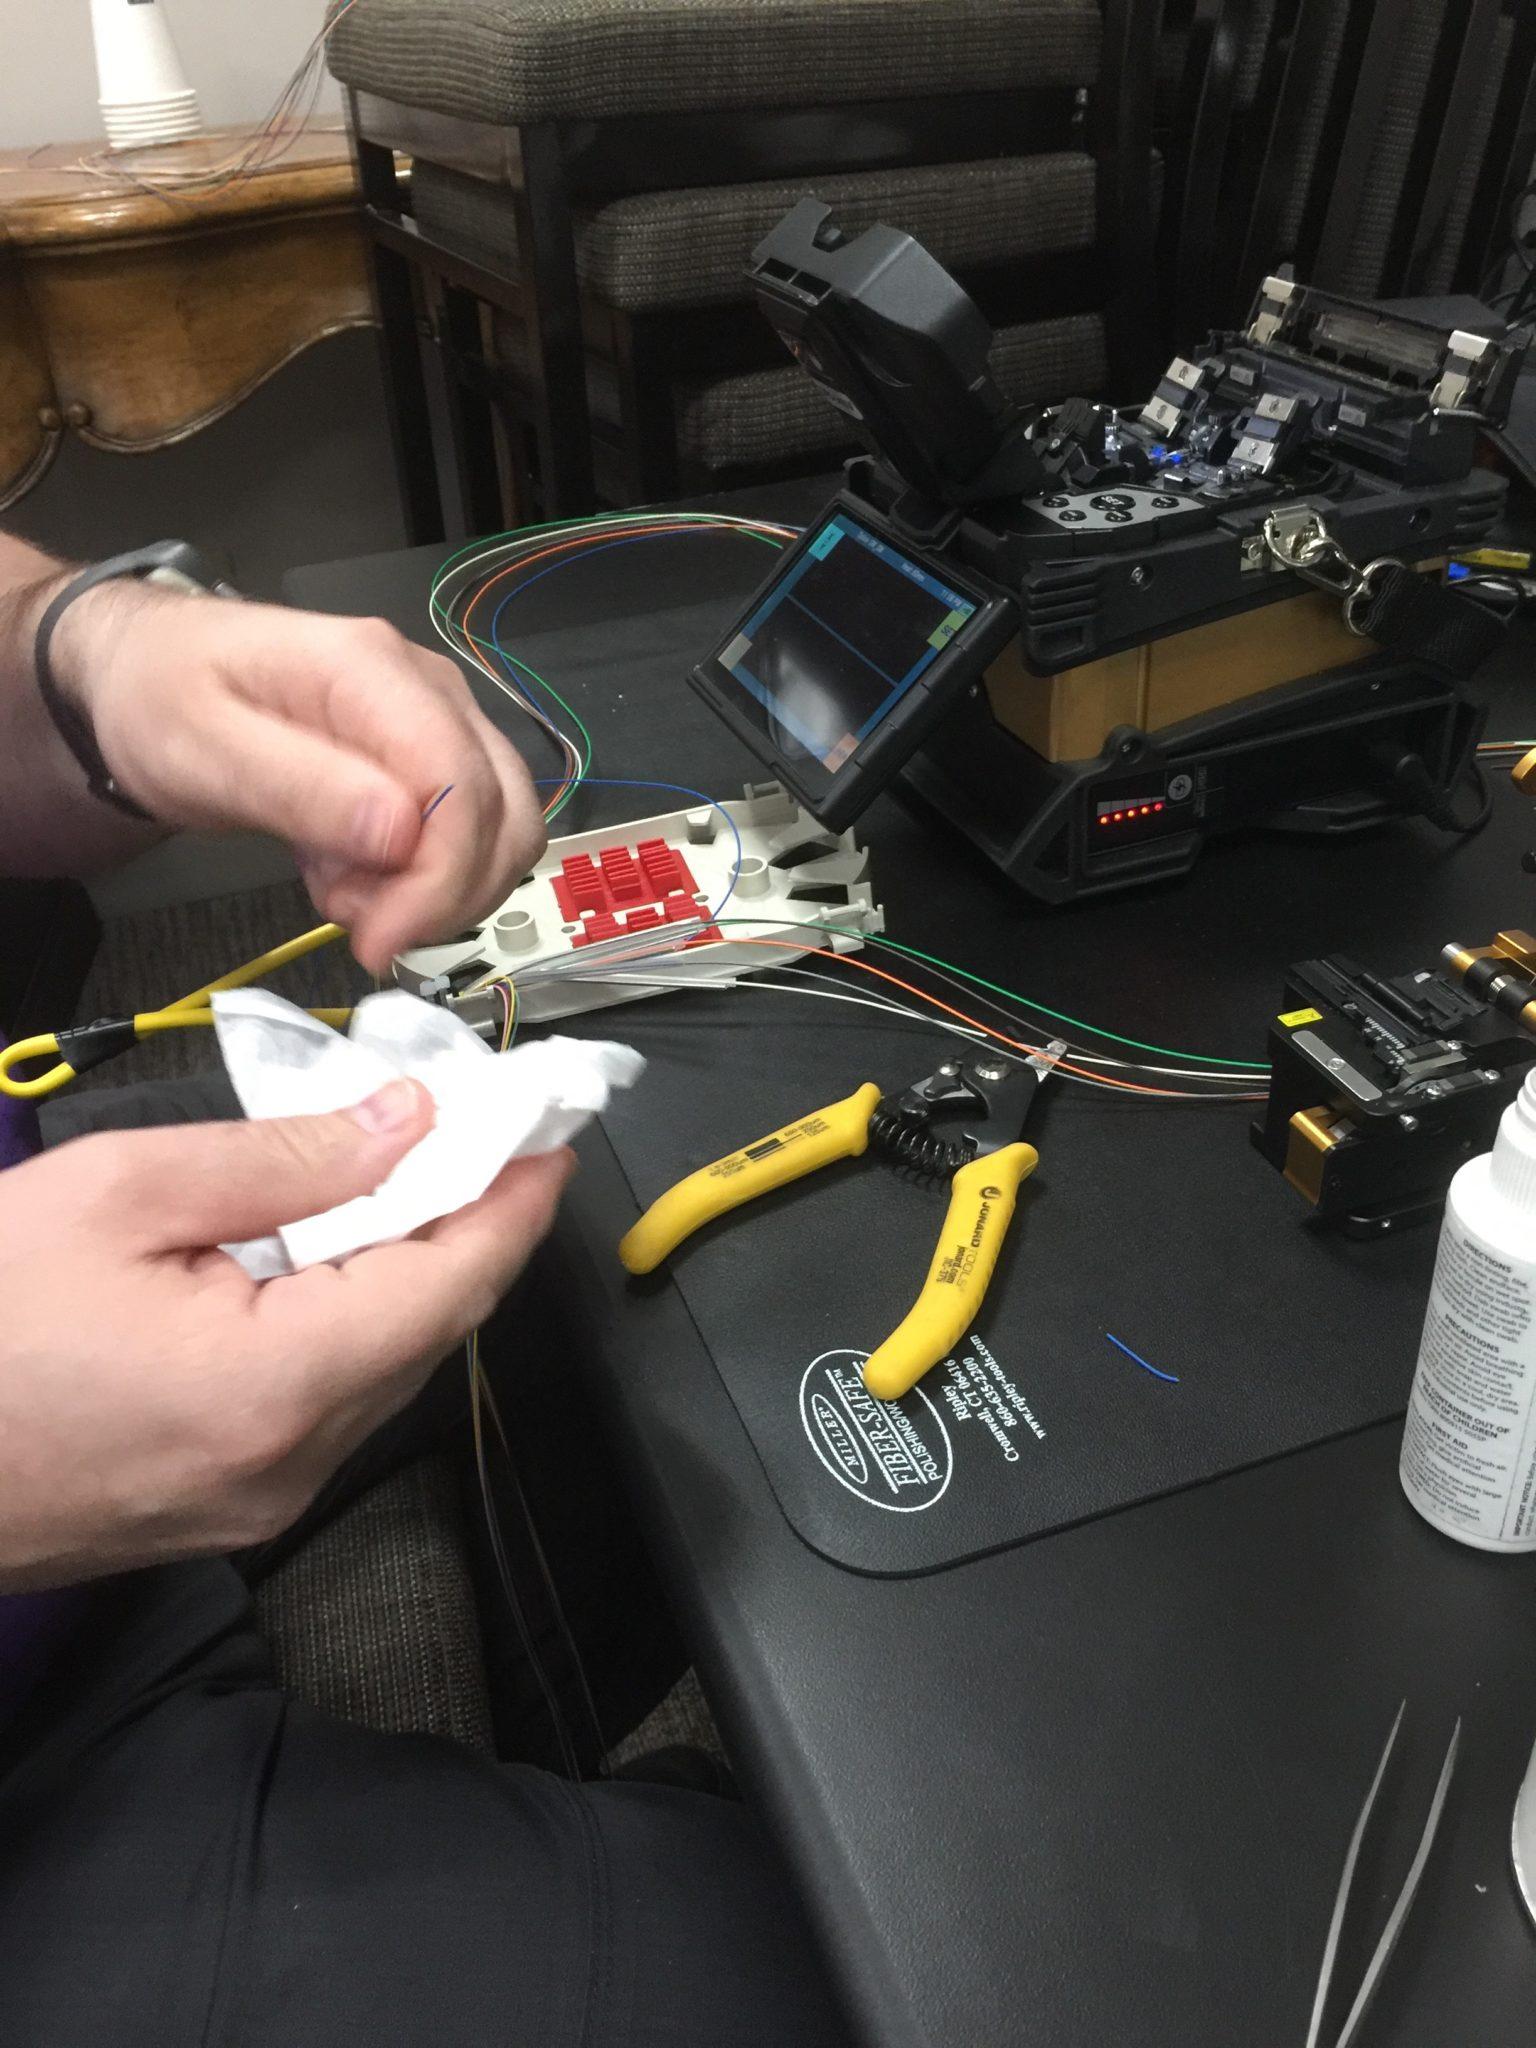 the fiber school  u2013 fiber optic training and certifcation